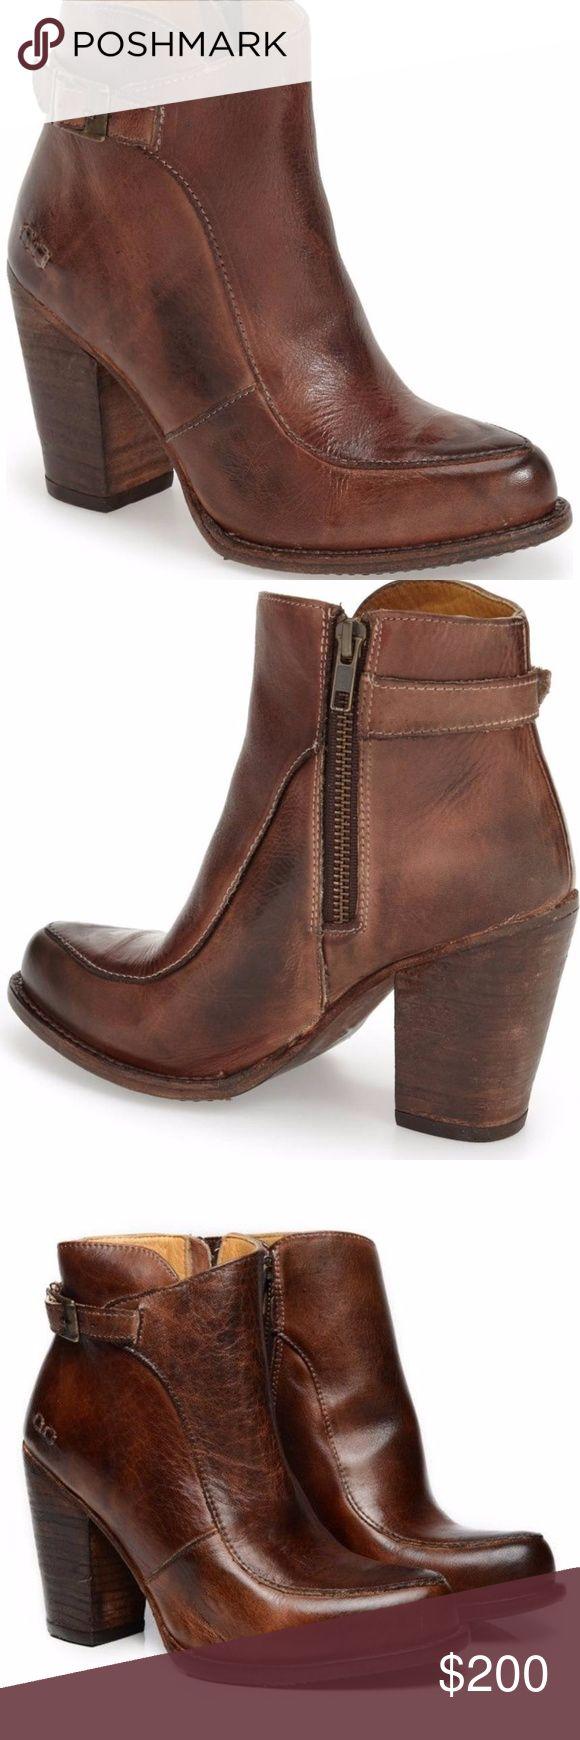 "BED STU Isla Teak Rustic Ladies Ankle Boots 7 BED STU Isla Teak Rustic Ladies Ankle Boots Womens 7 Stacked Heel Brown Leather, new no box, 3 3/4"" heel Bed Stu Shoes Ankle Boots & Booties"